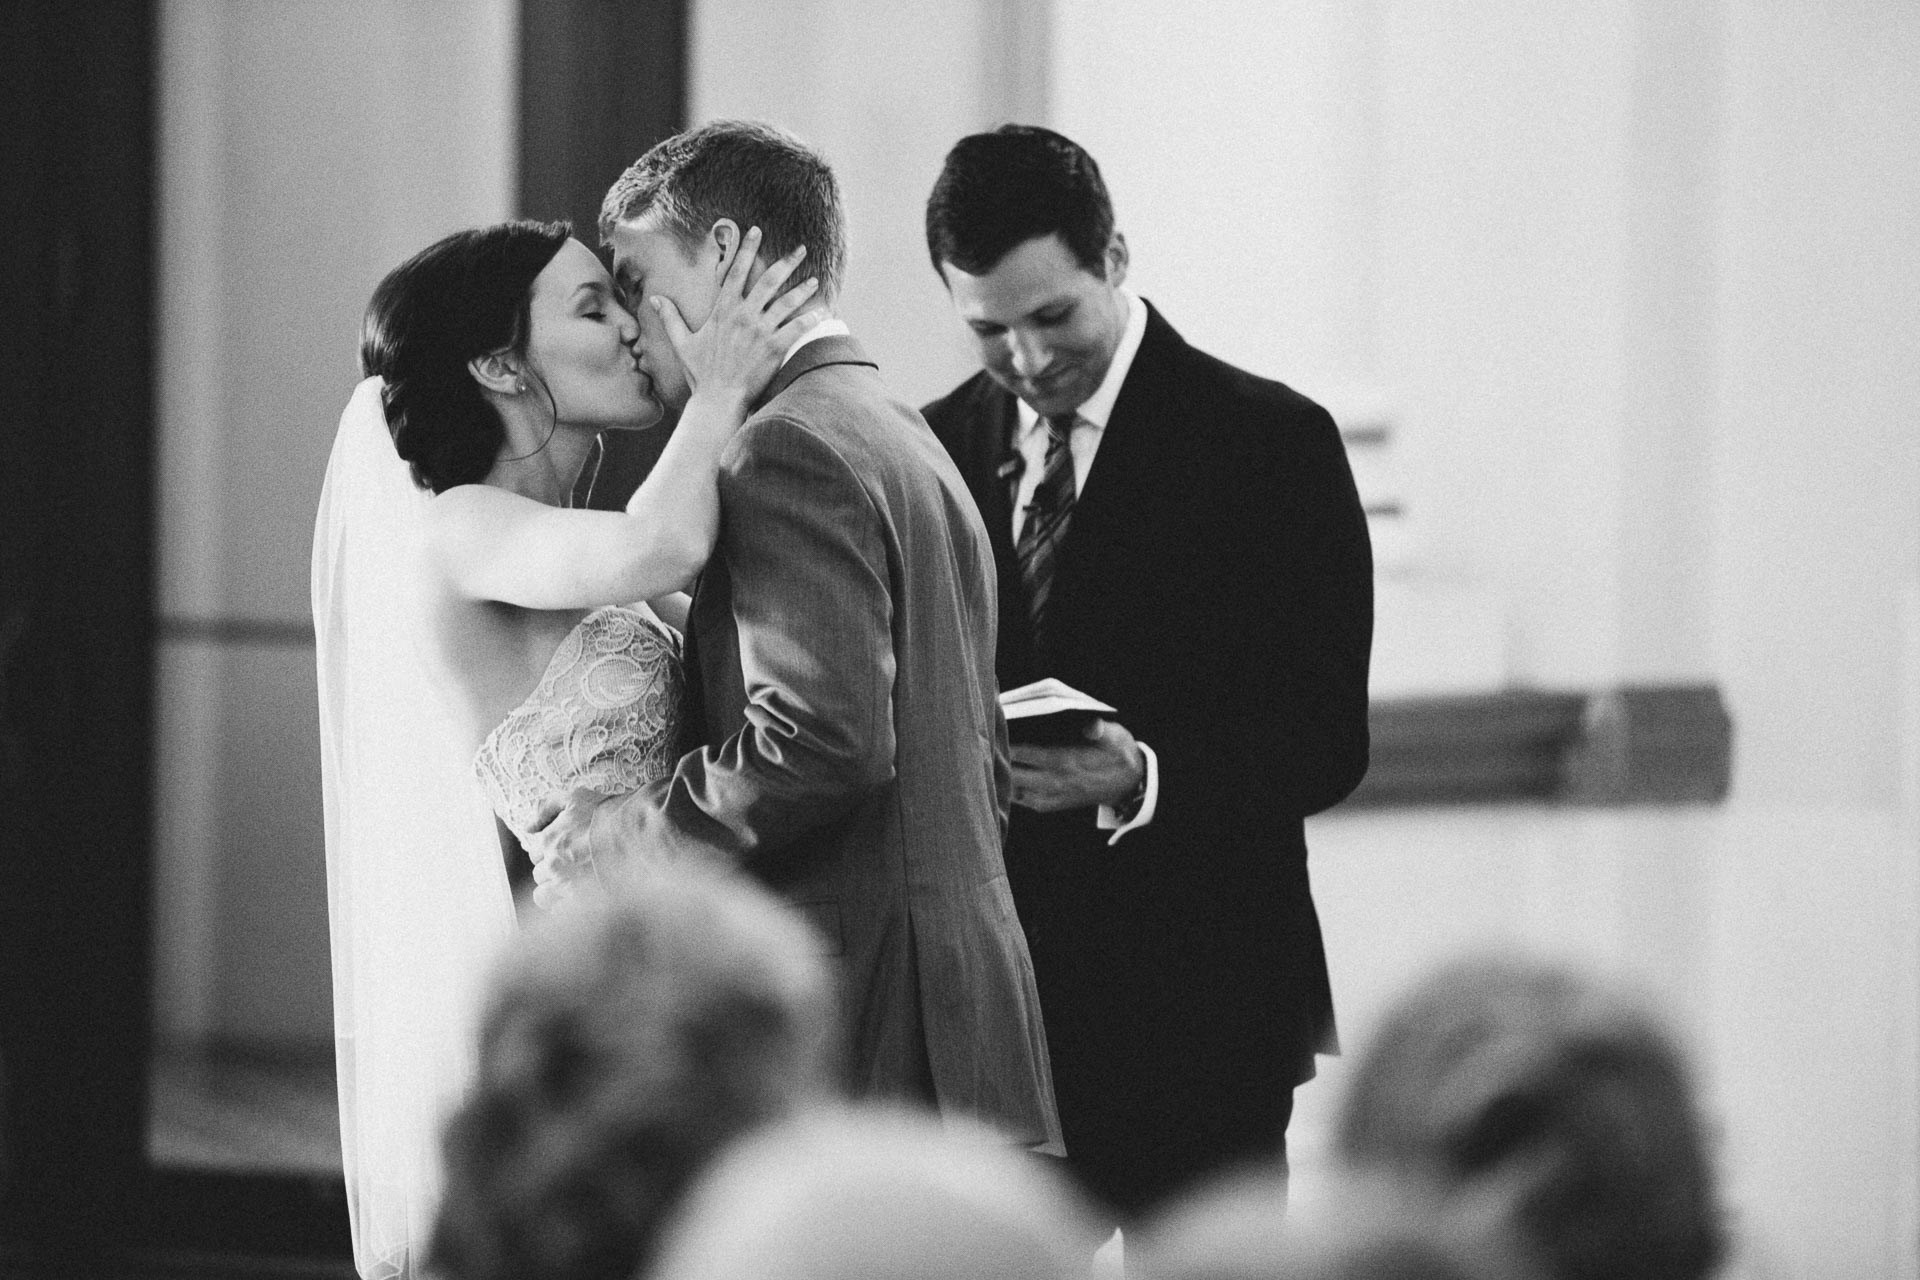 Julia-Michael-Cincinnati-Music-Hall-Wedding-108@2x.jpg